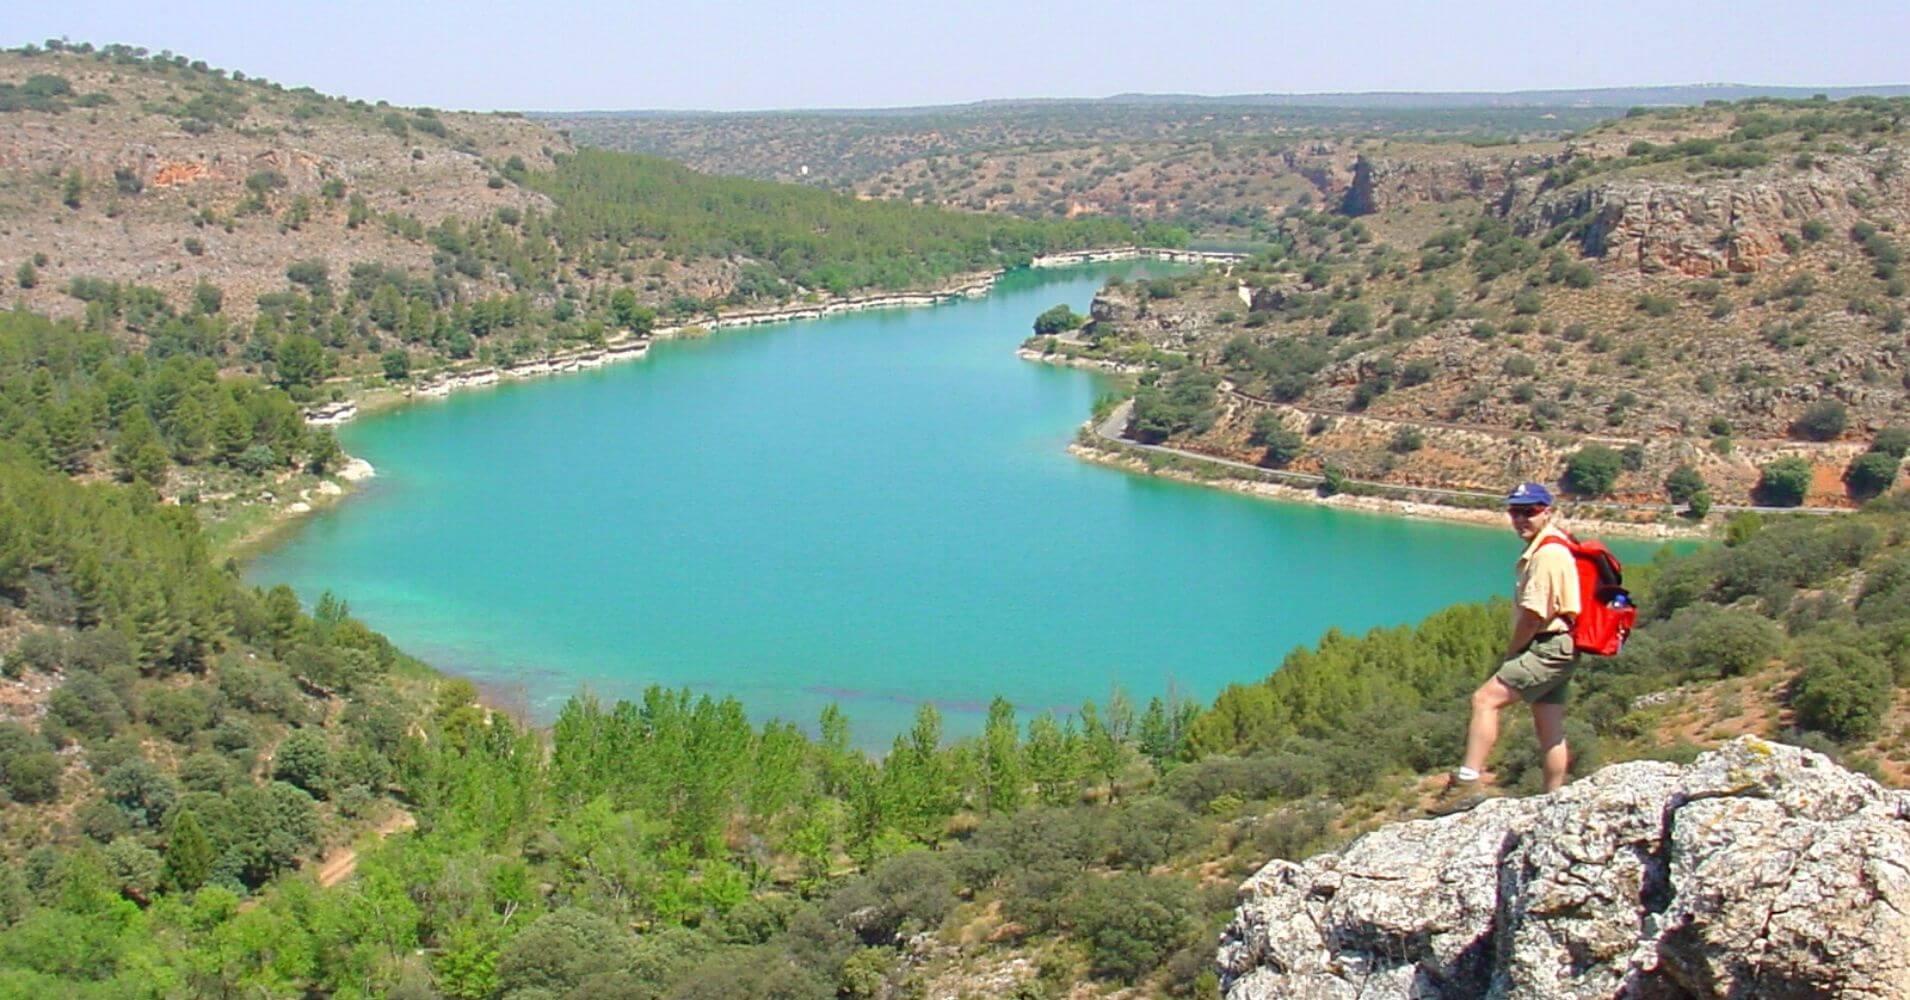 Parque Natural Lagunas de Ruidera. Laguna de la Lengua. Ciudad Real. Castilla la Mancha.